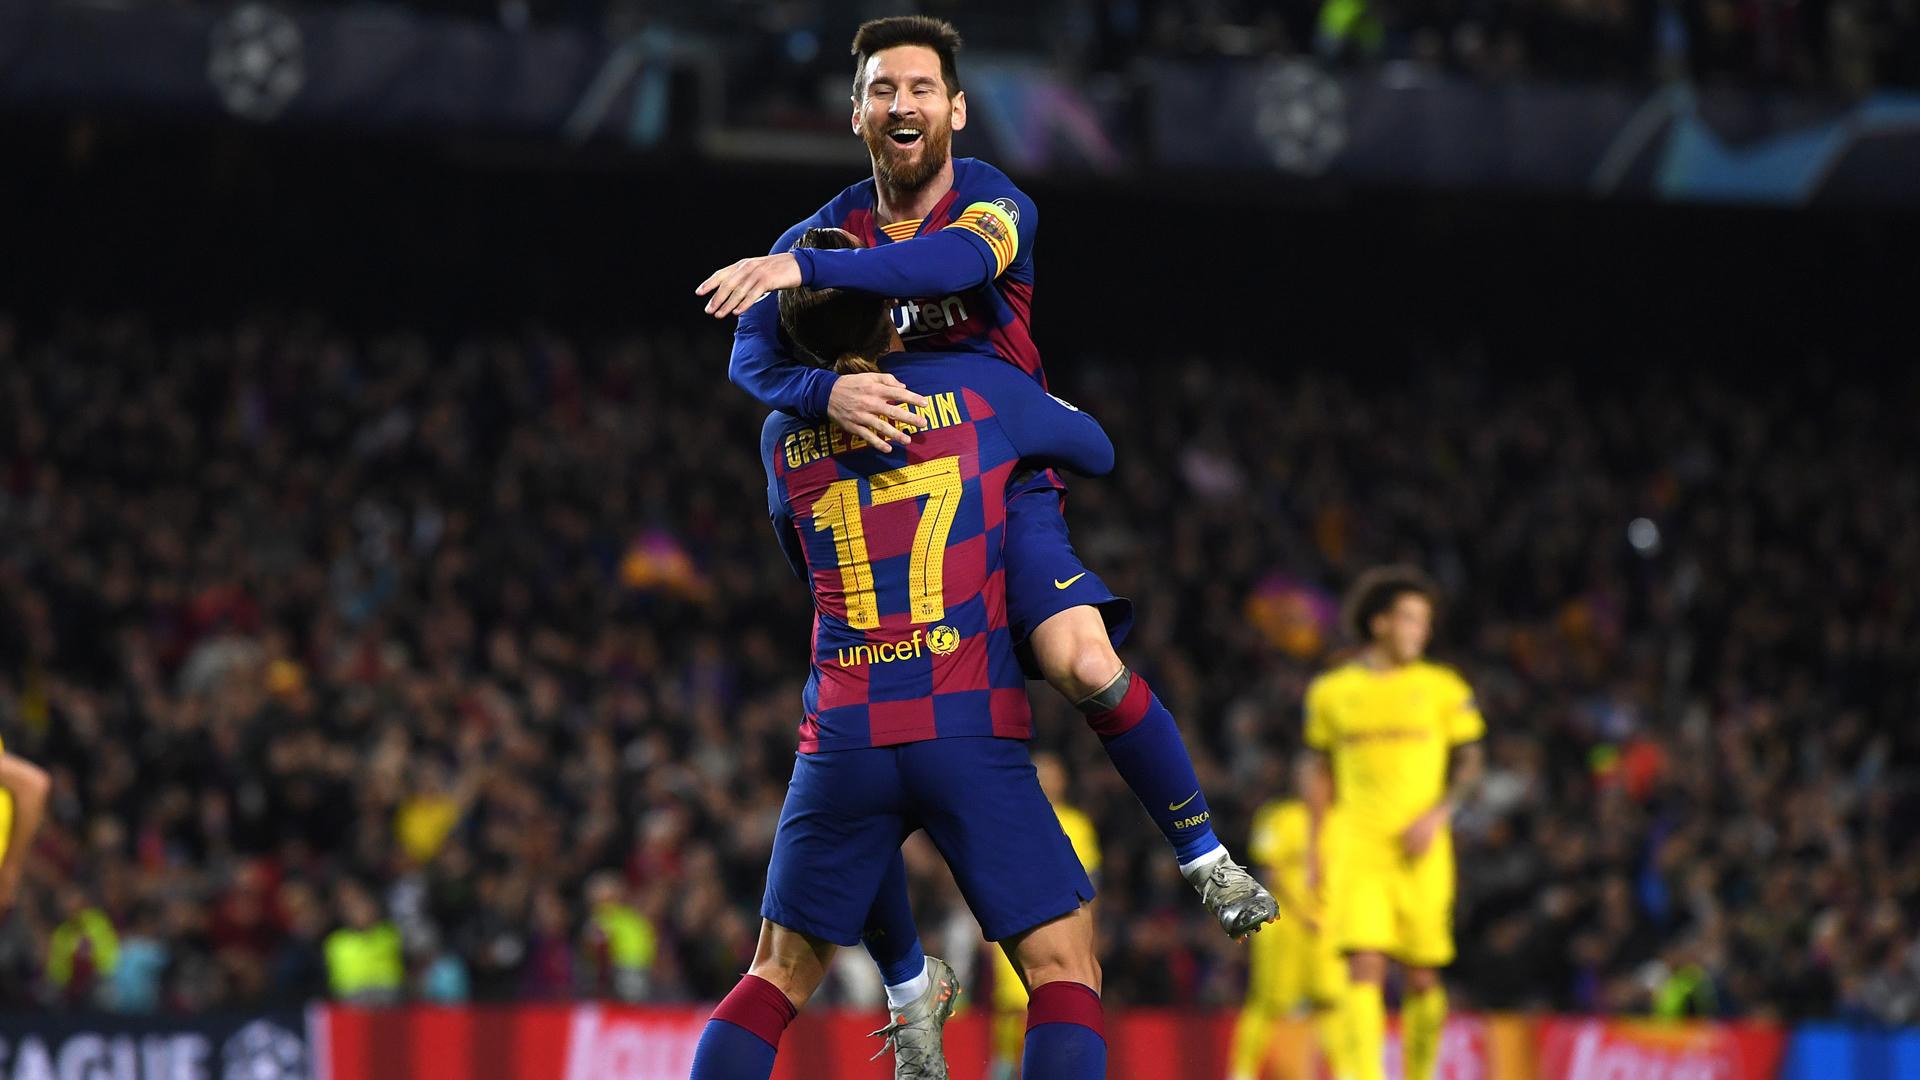 Valverde praises 'amazing' Messi after Dortmund masterclass